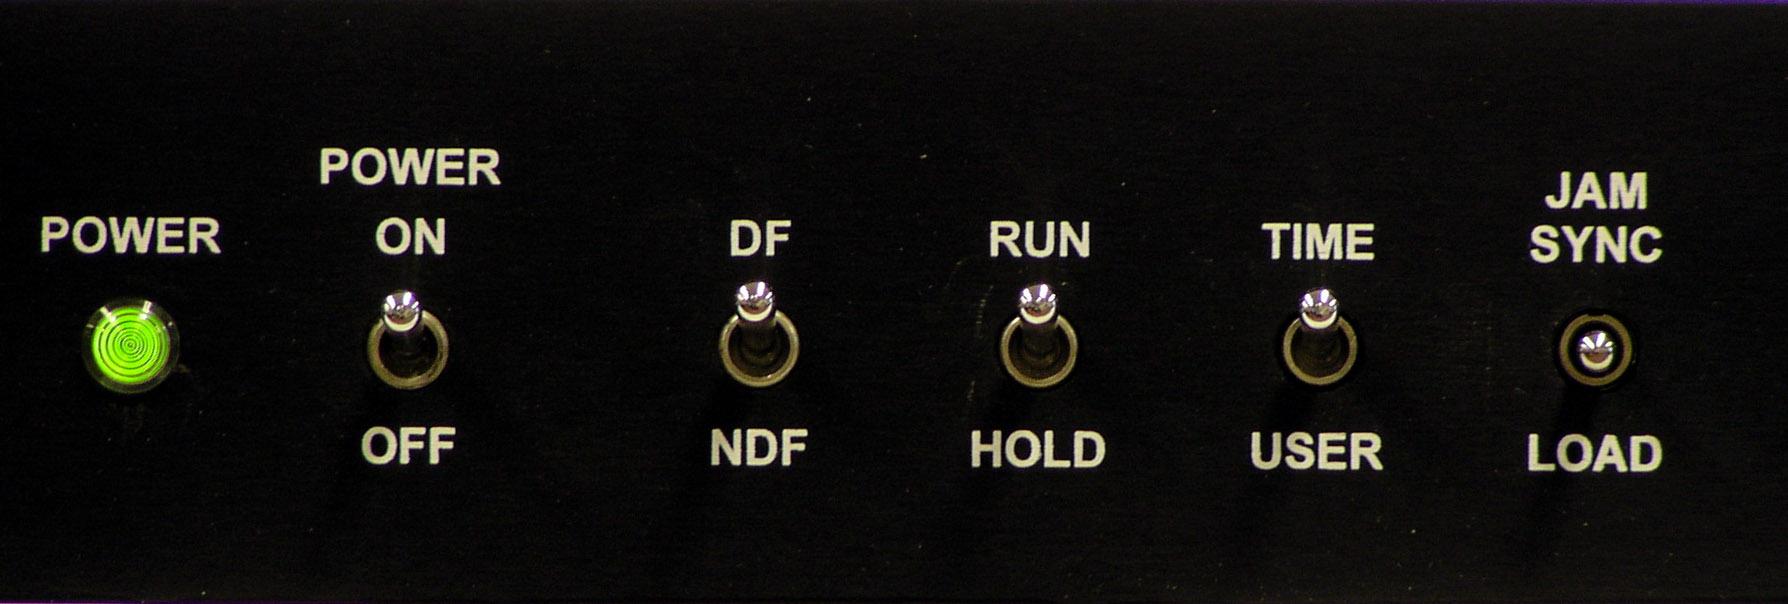 ES-461U Switches